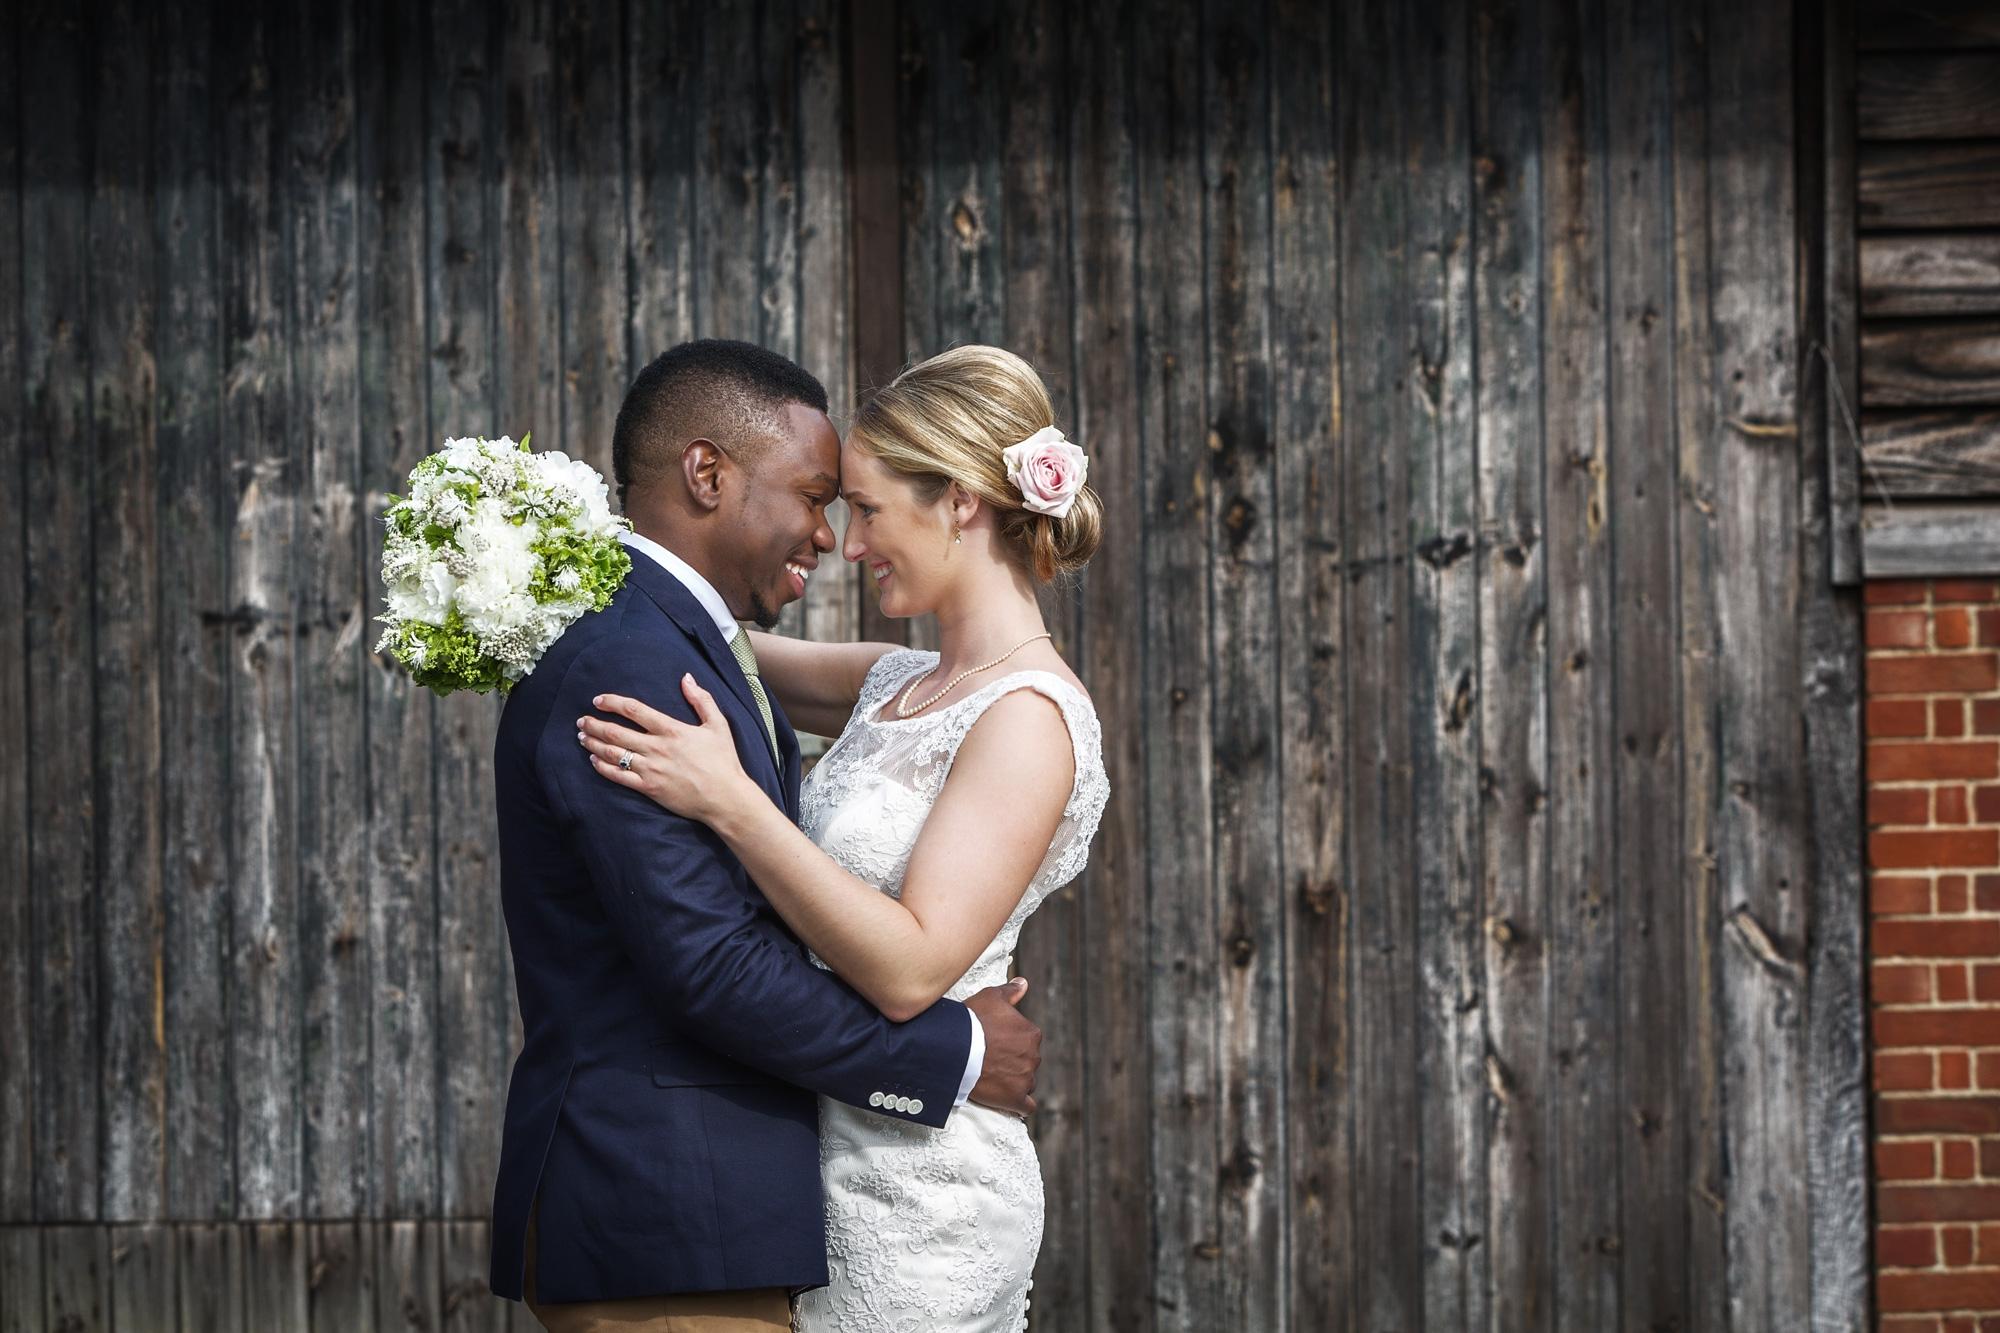 Adam_Hillier_Wedding_Photographer_Newbury_Berkshire_1 (8).jpg